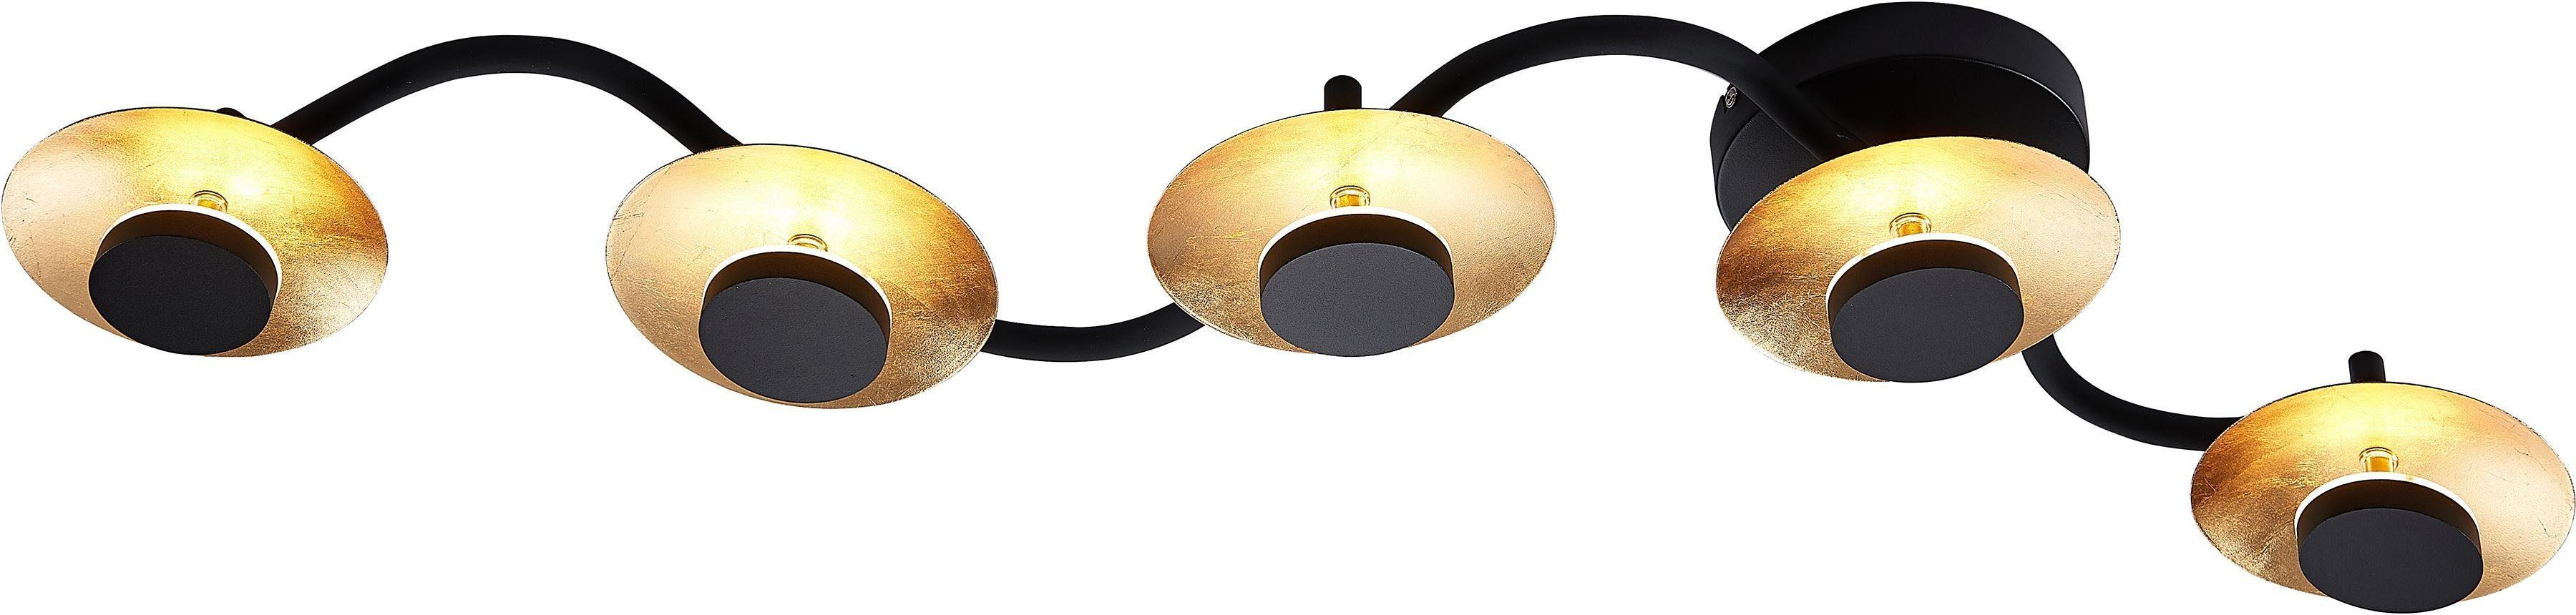 Nino Leuchten,LED Deckenleuchte Limber